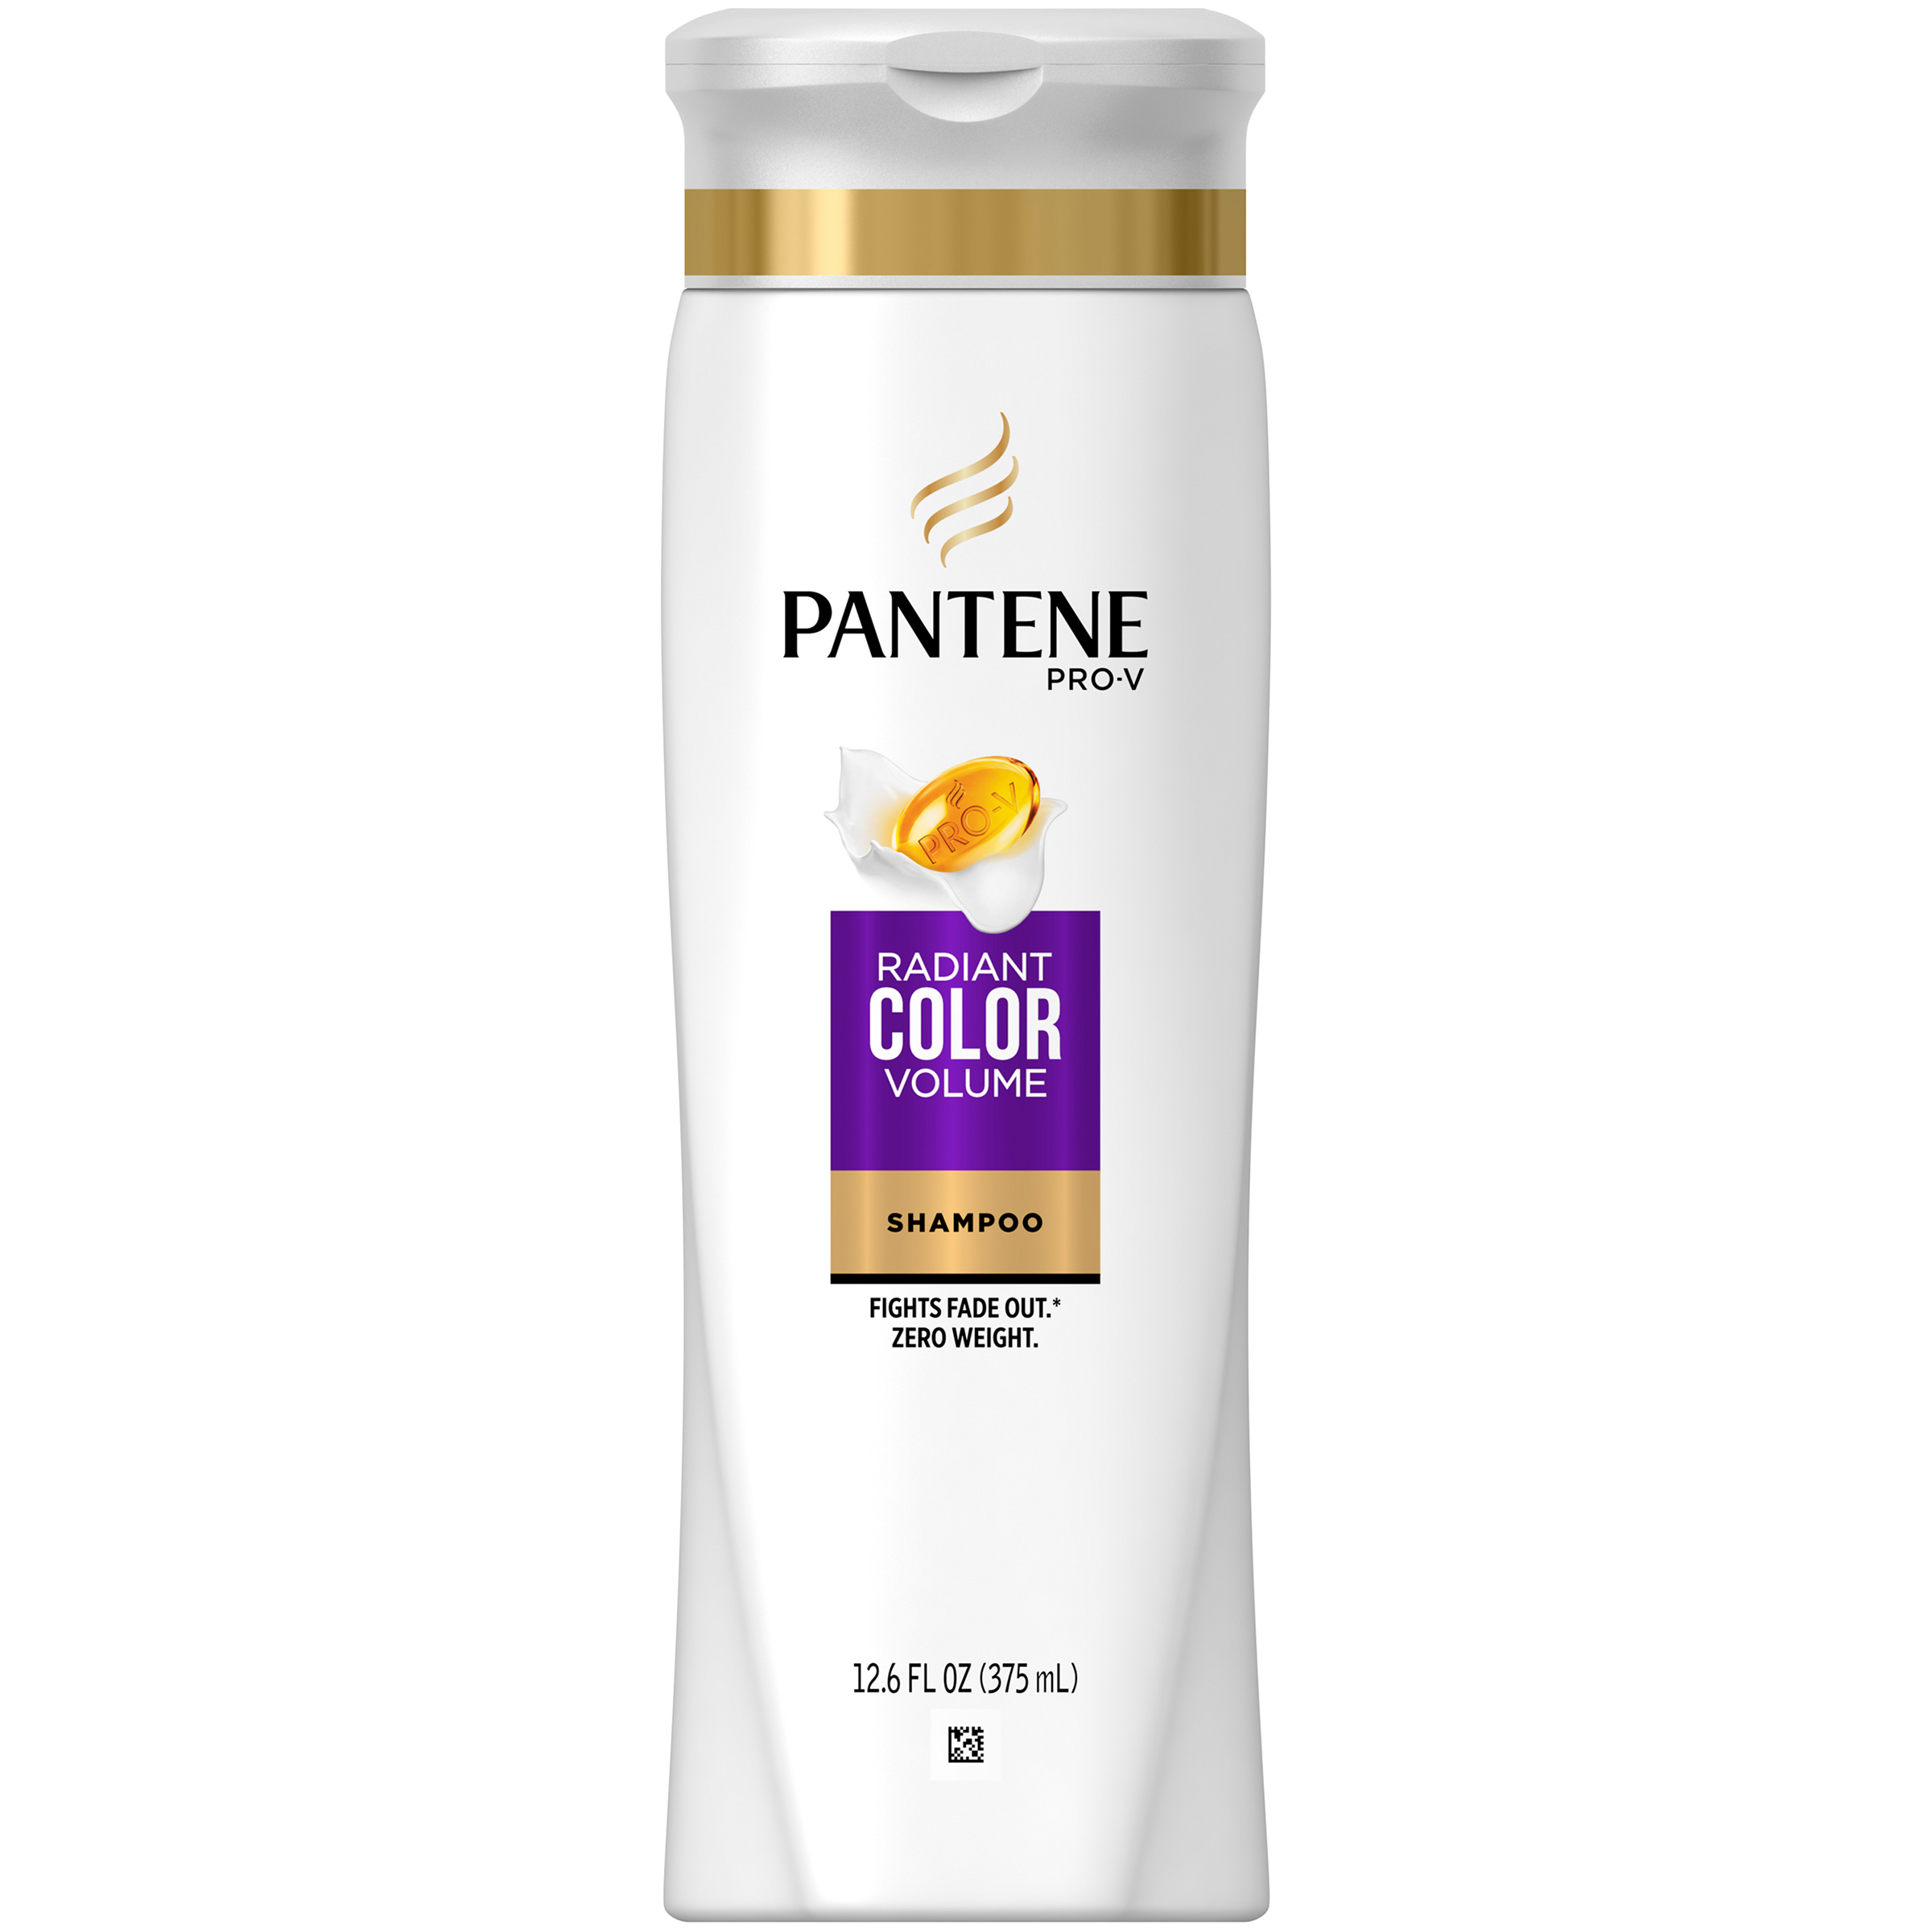 PANTENE - SHAMPOO - (Radiant Color | Volume) - 12.6oz